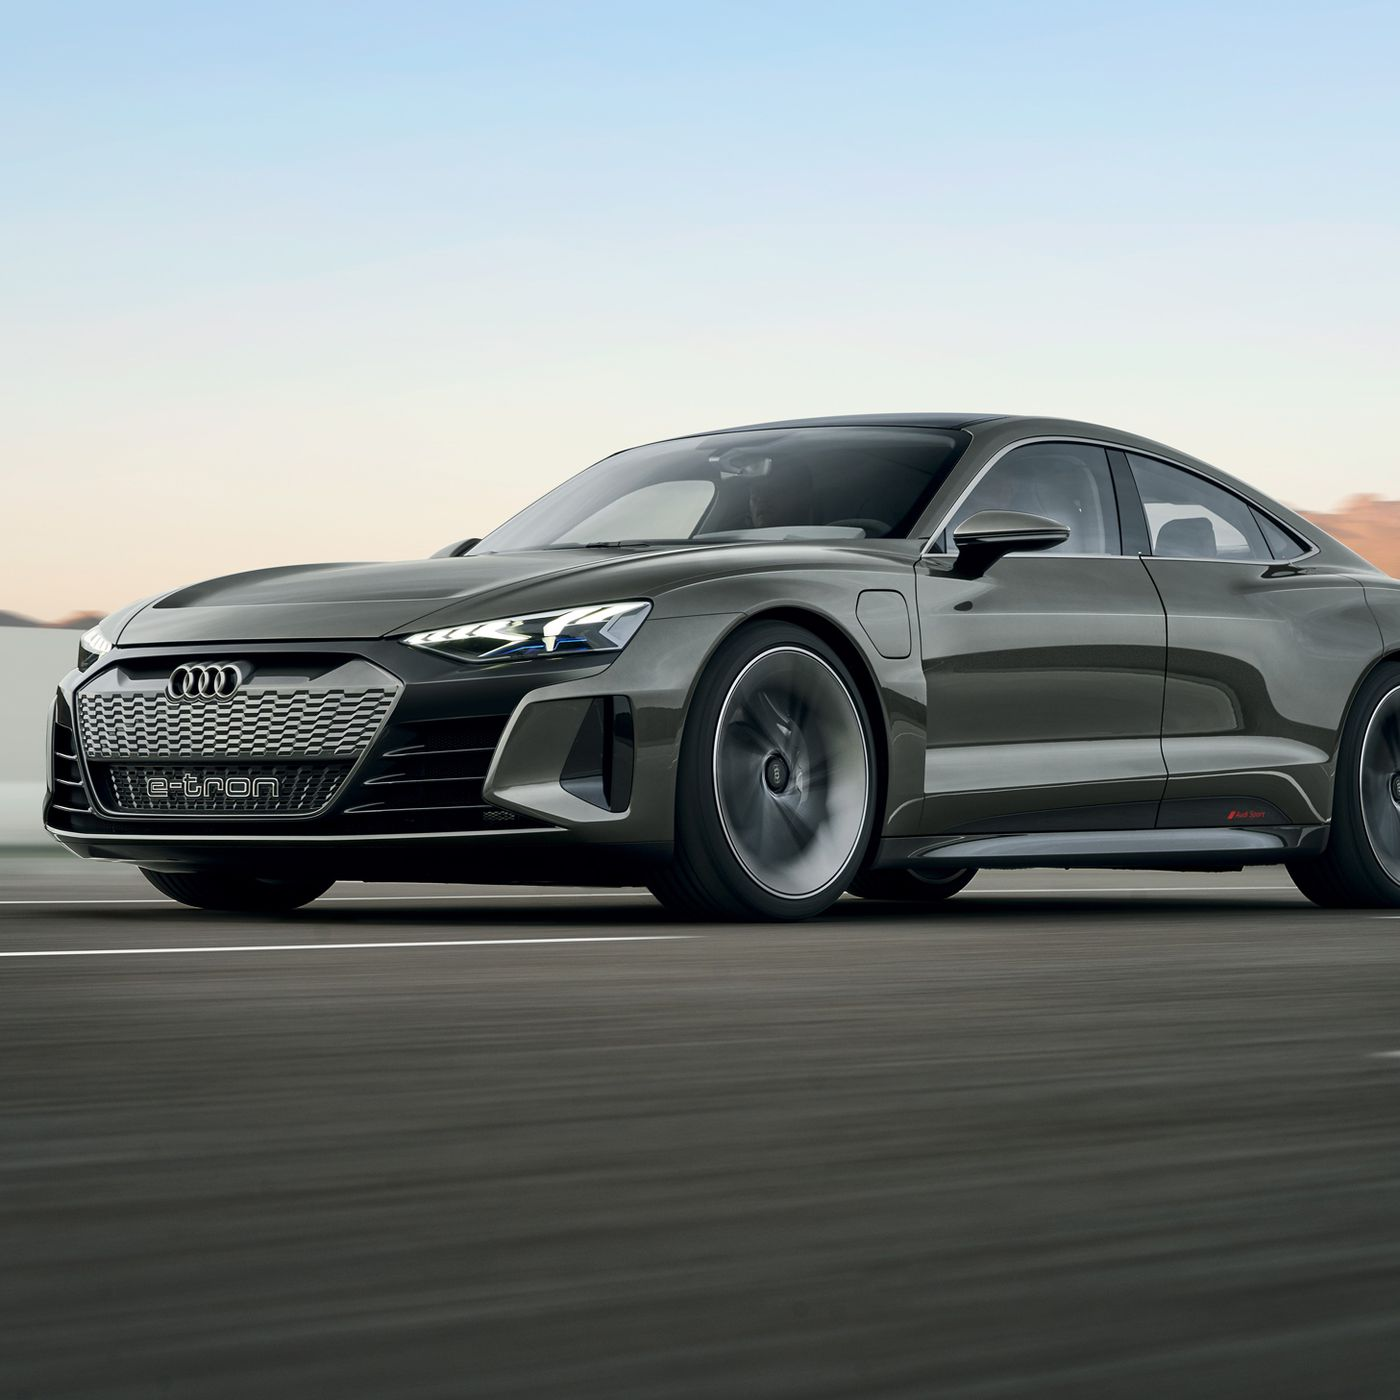 Audi S E Tron Gt Concept Is A 590 Horsepower Electric Sedan Powered By Porsche The Verge